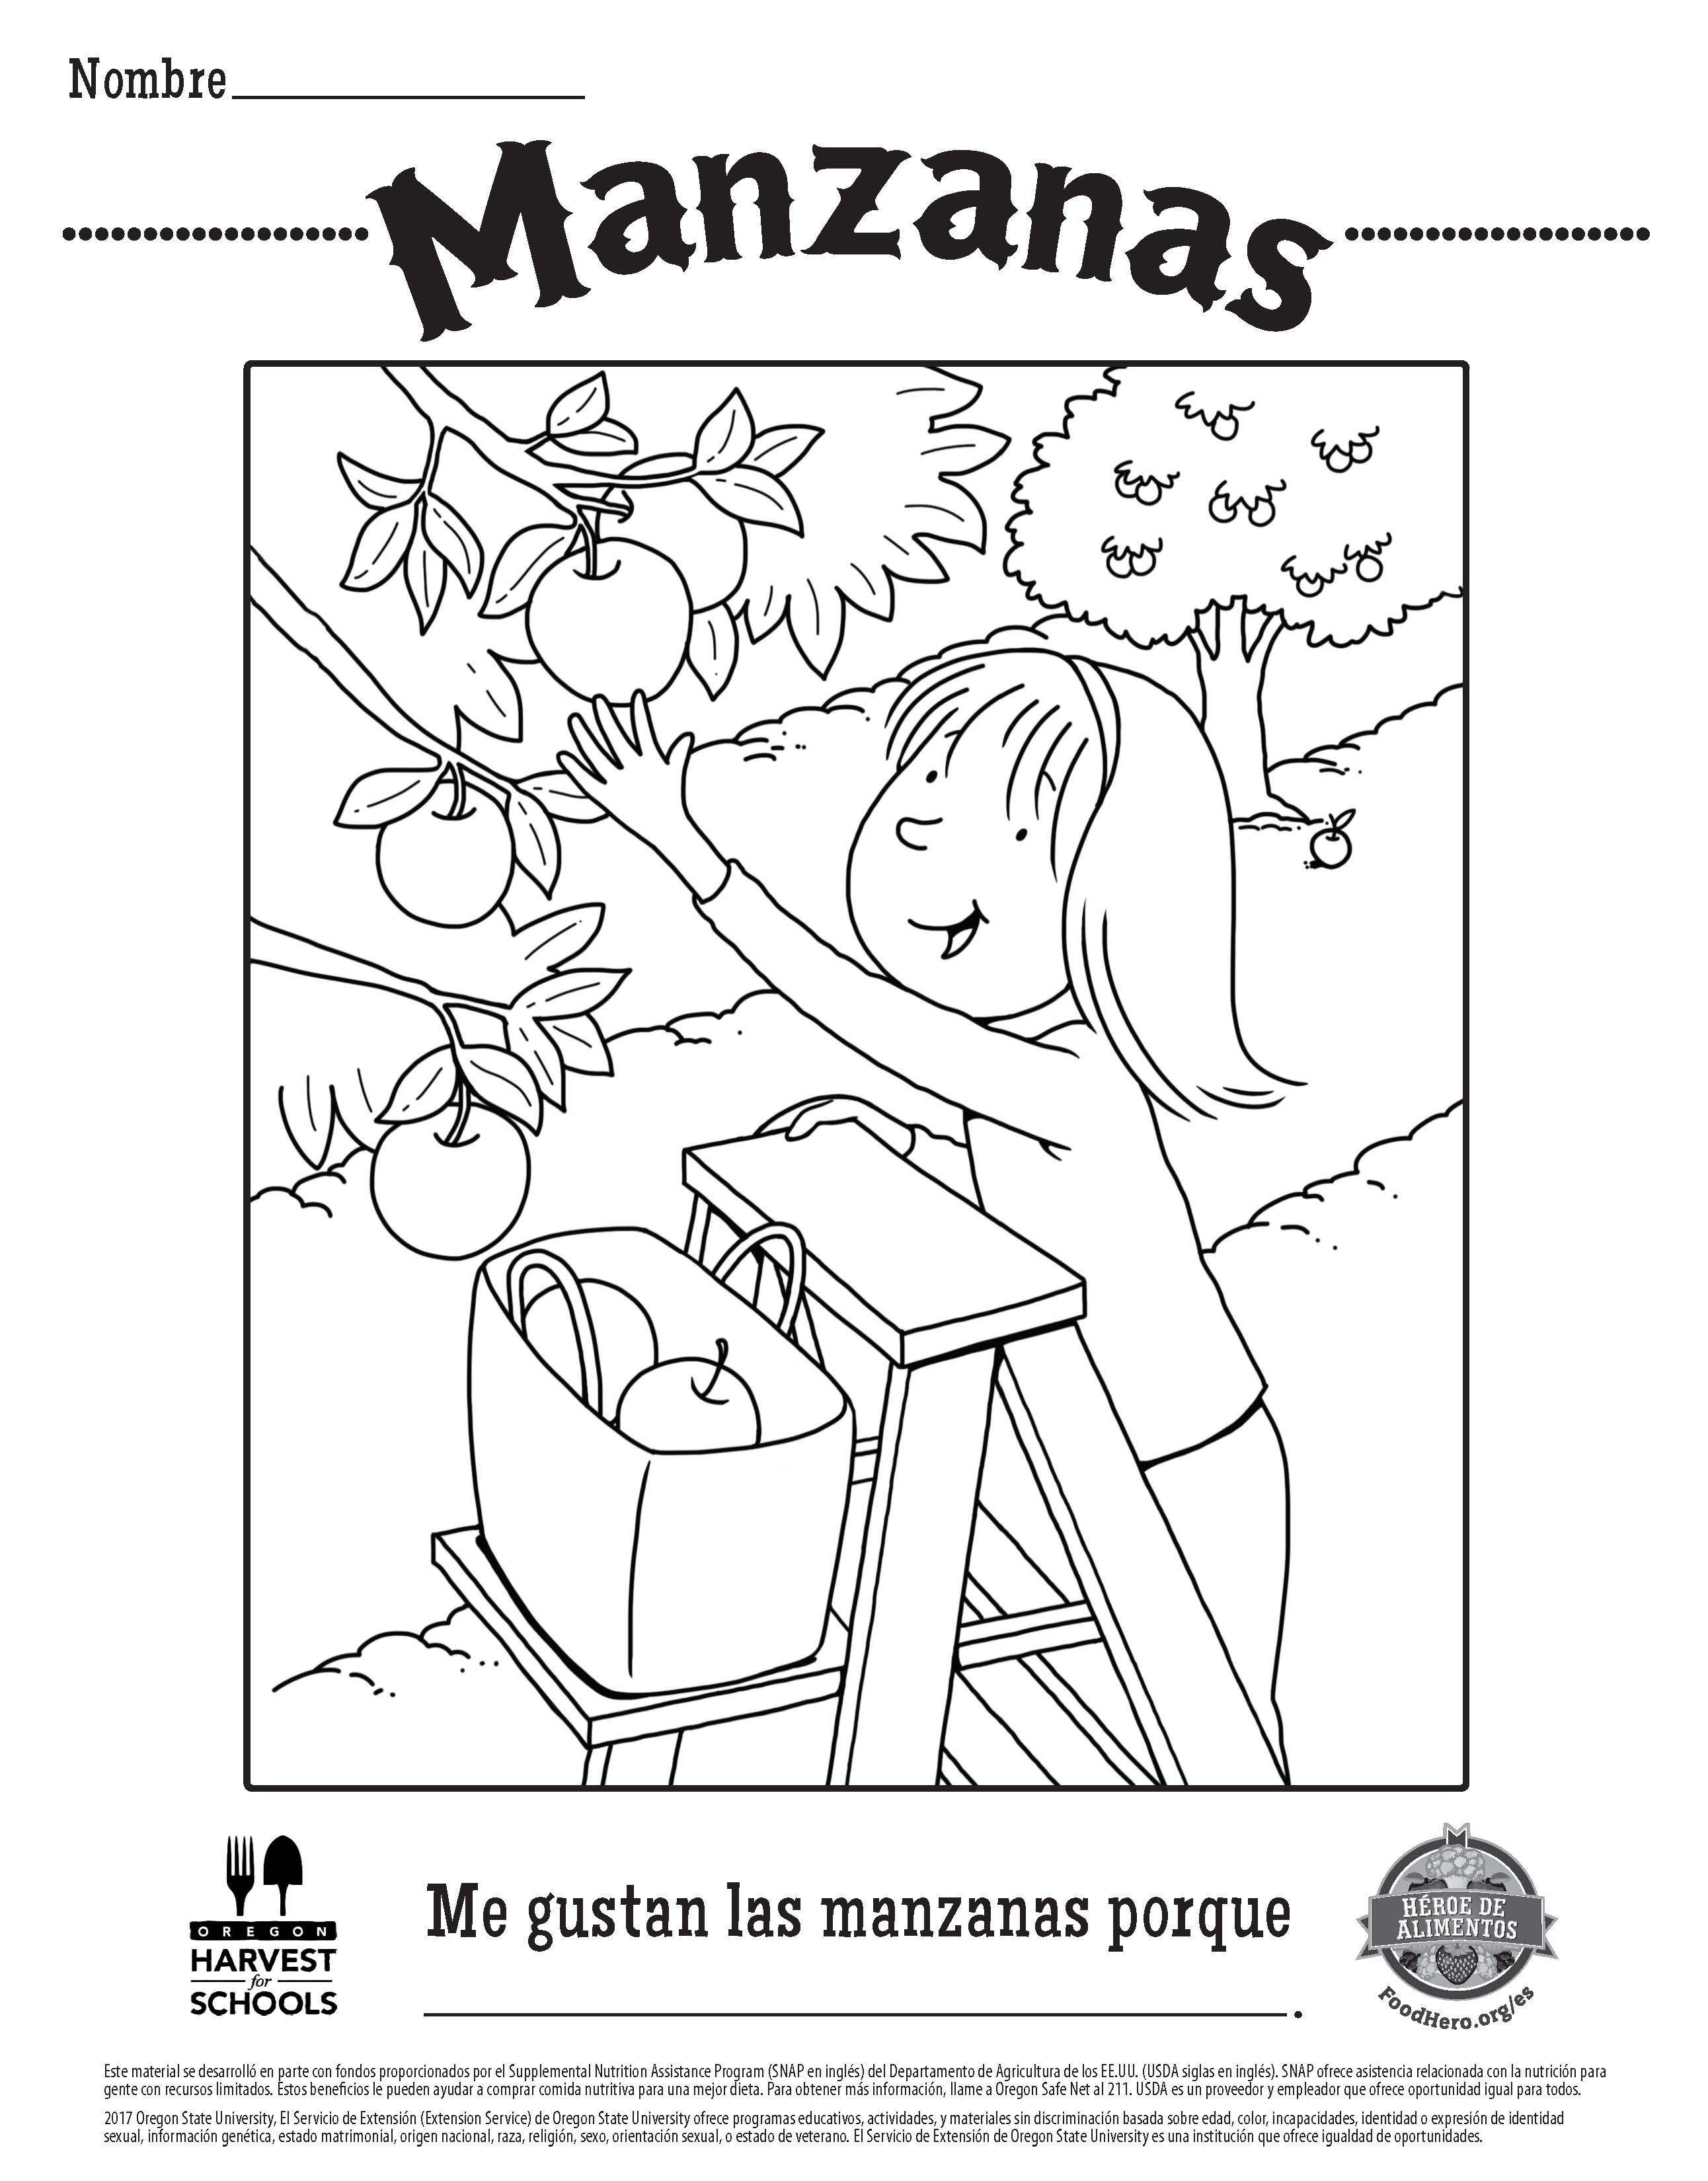 Free Printable Food Hero Apple Coloring Sheet In Spanish - Free Coloring Printables